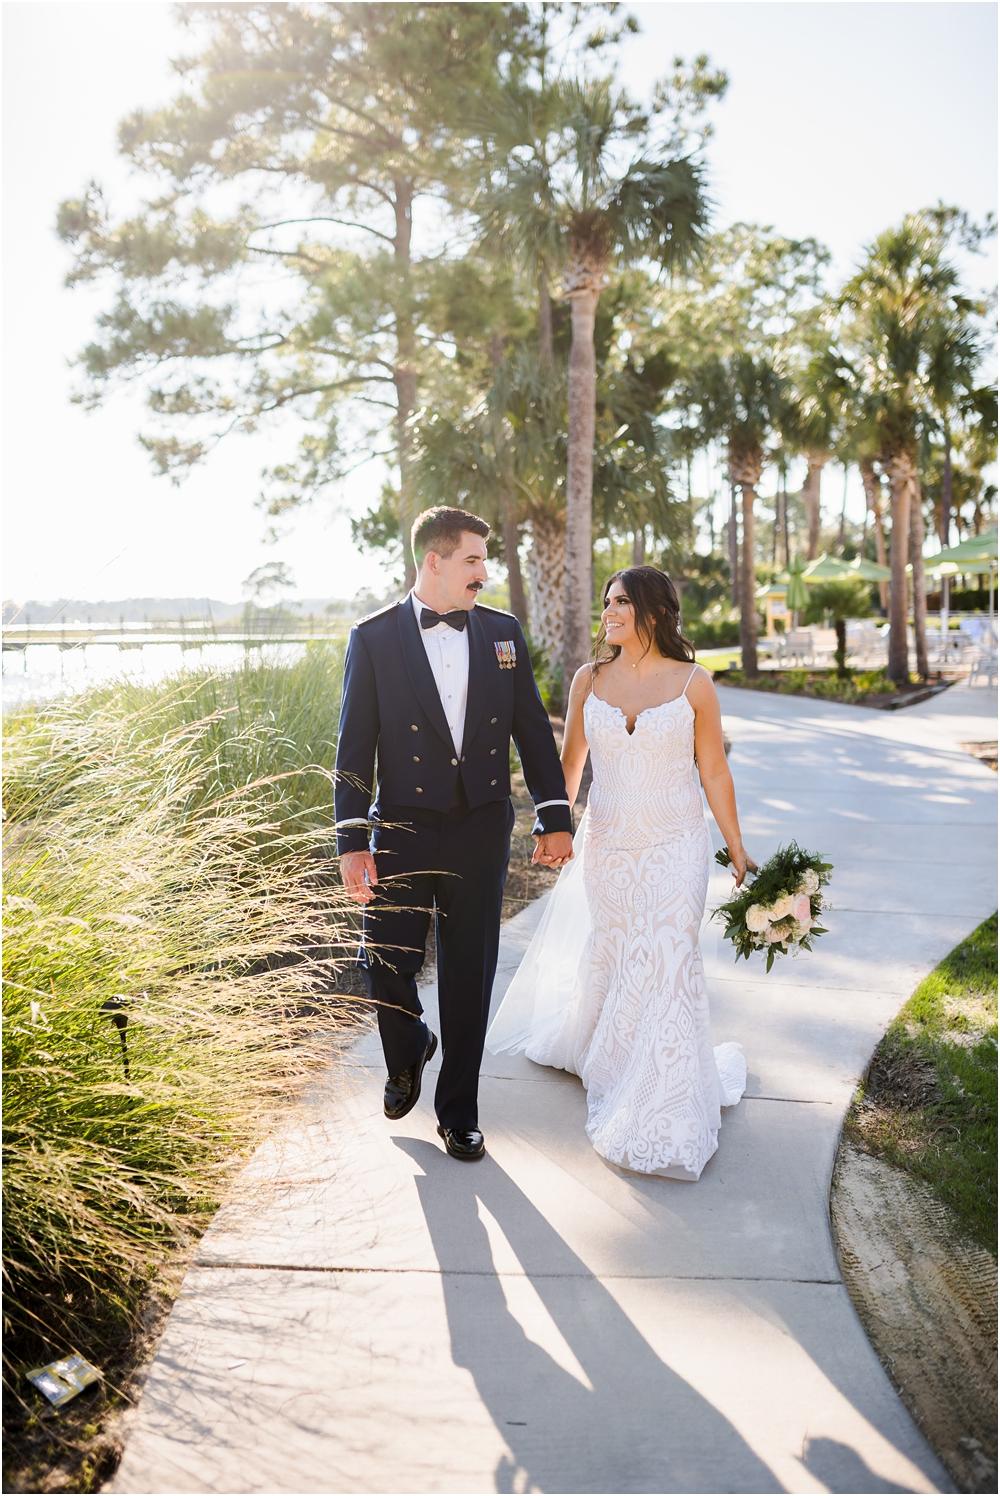 amack-wedding-kiersten-stevenson-photography-30a-panama-city-beach-dothan-tallahassee-(239-of-882).JPG